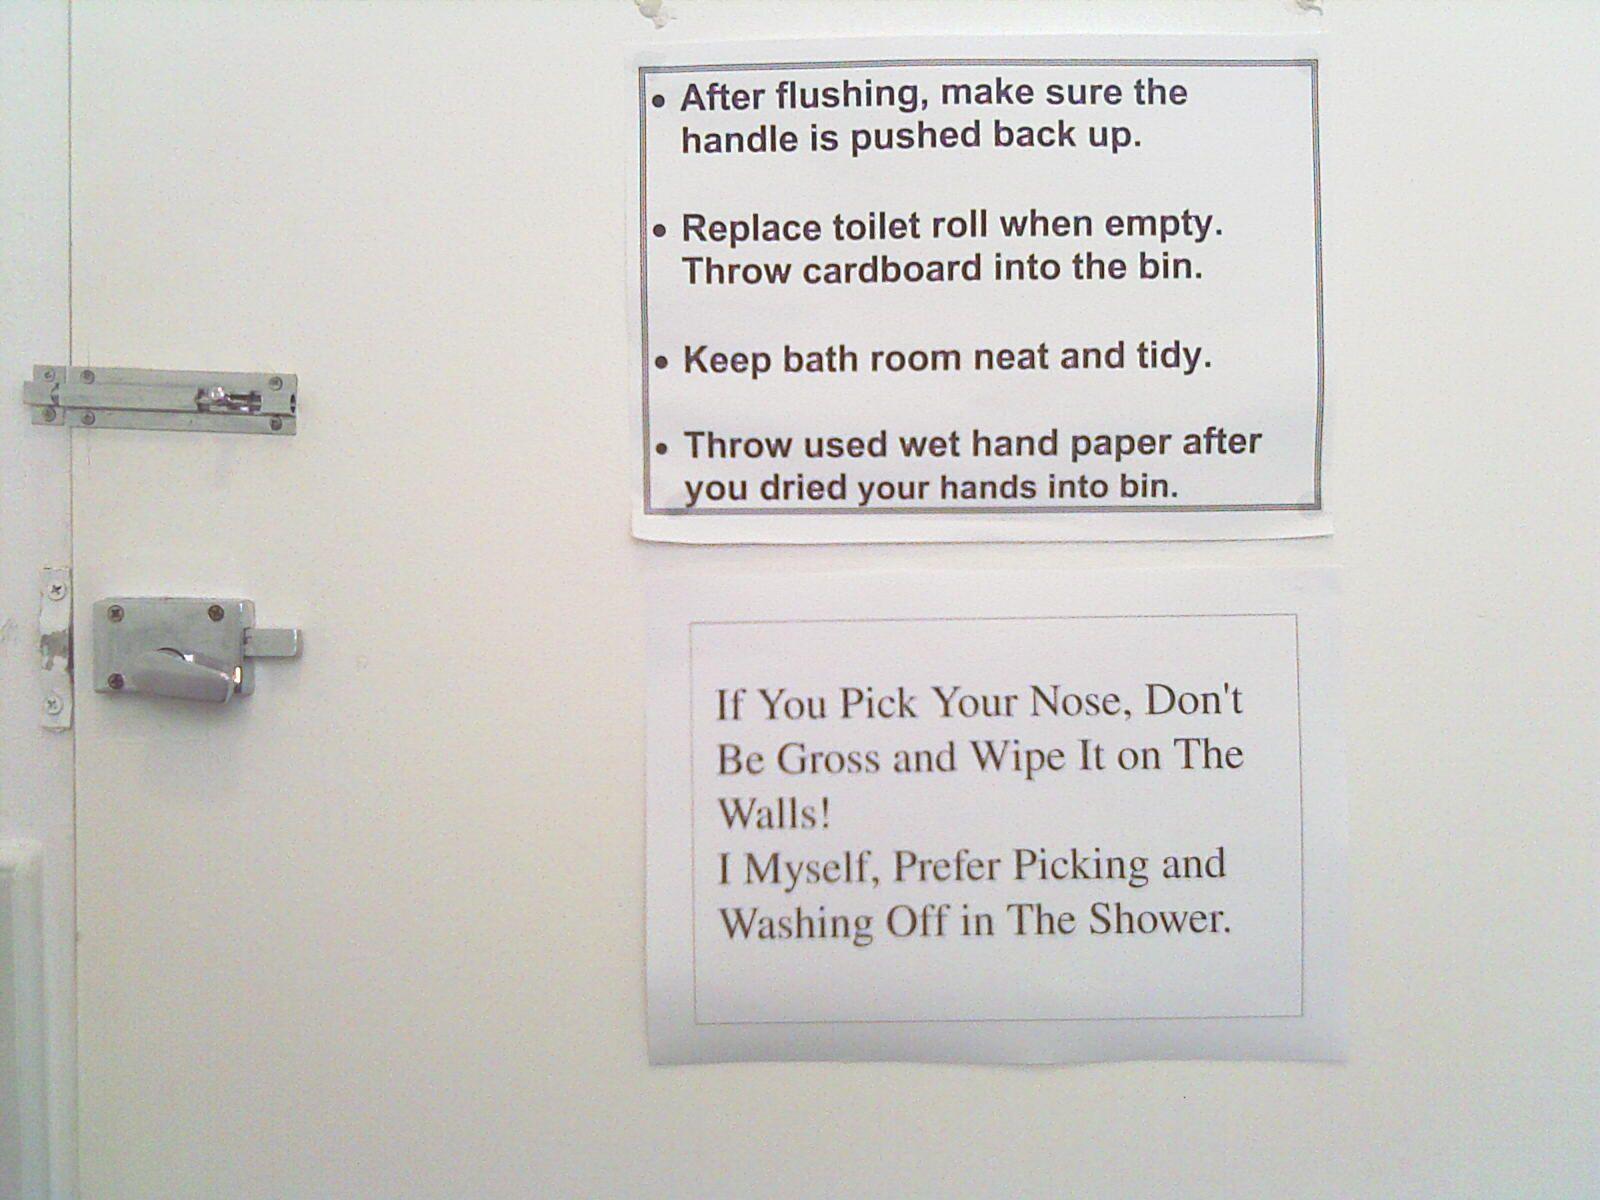 Bathroom Etiquette Signs For Office bathroom sign off sheet cleaning | pinterdor | pinterest